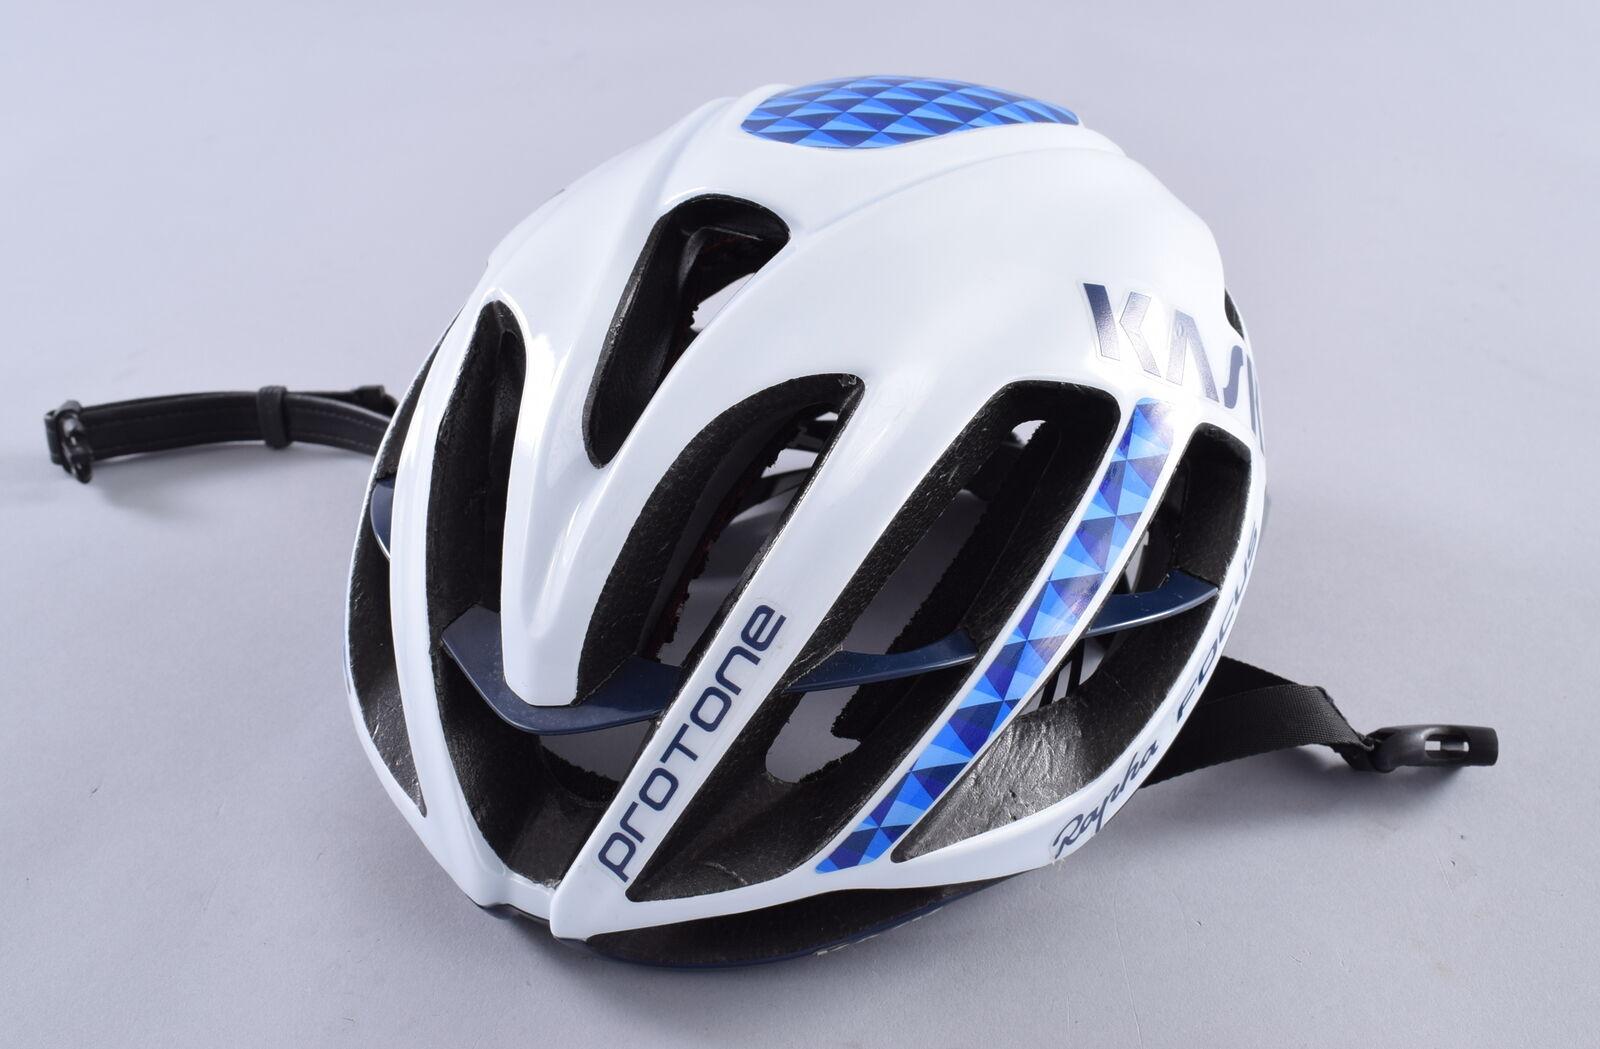 Kask Prossoone 2.0 Rapha Focus Helmet Adjustable Medium 52-58 CM Cycling strada Bike